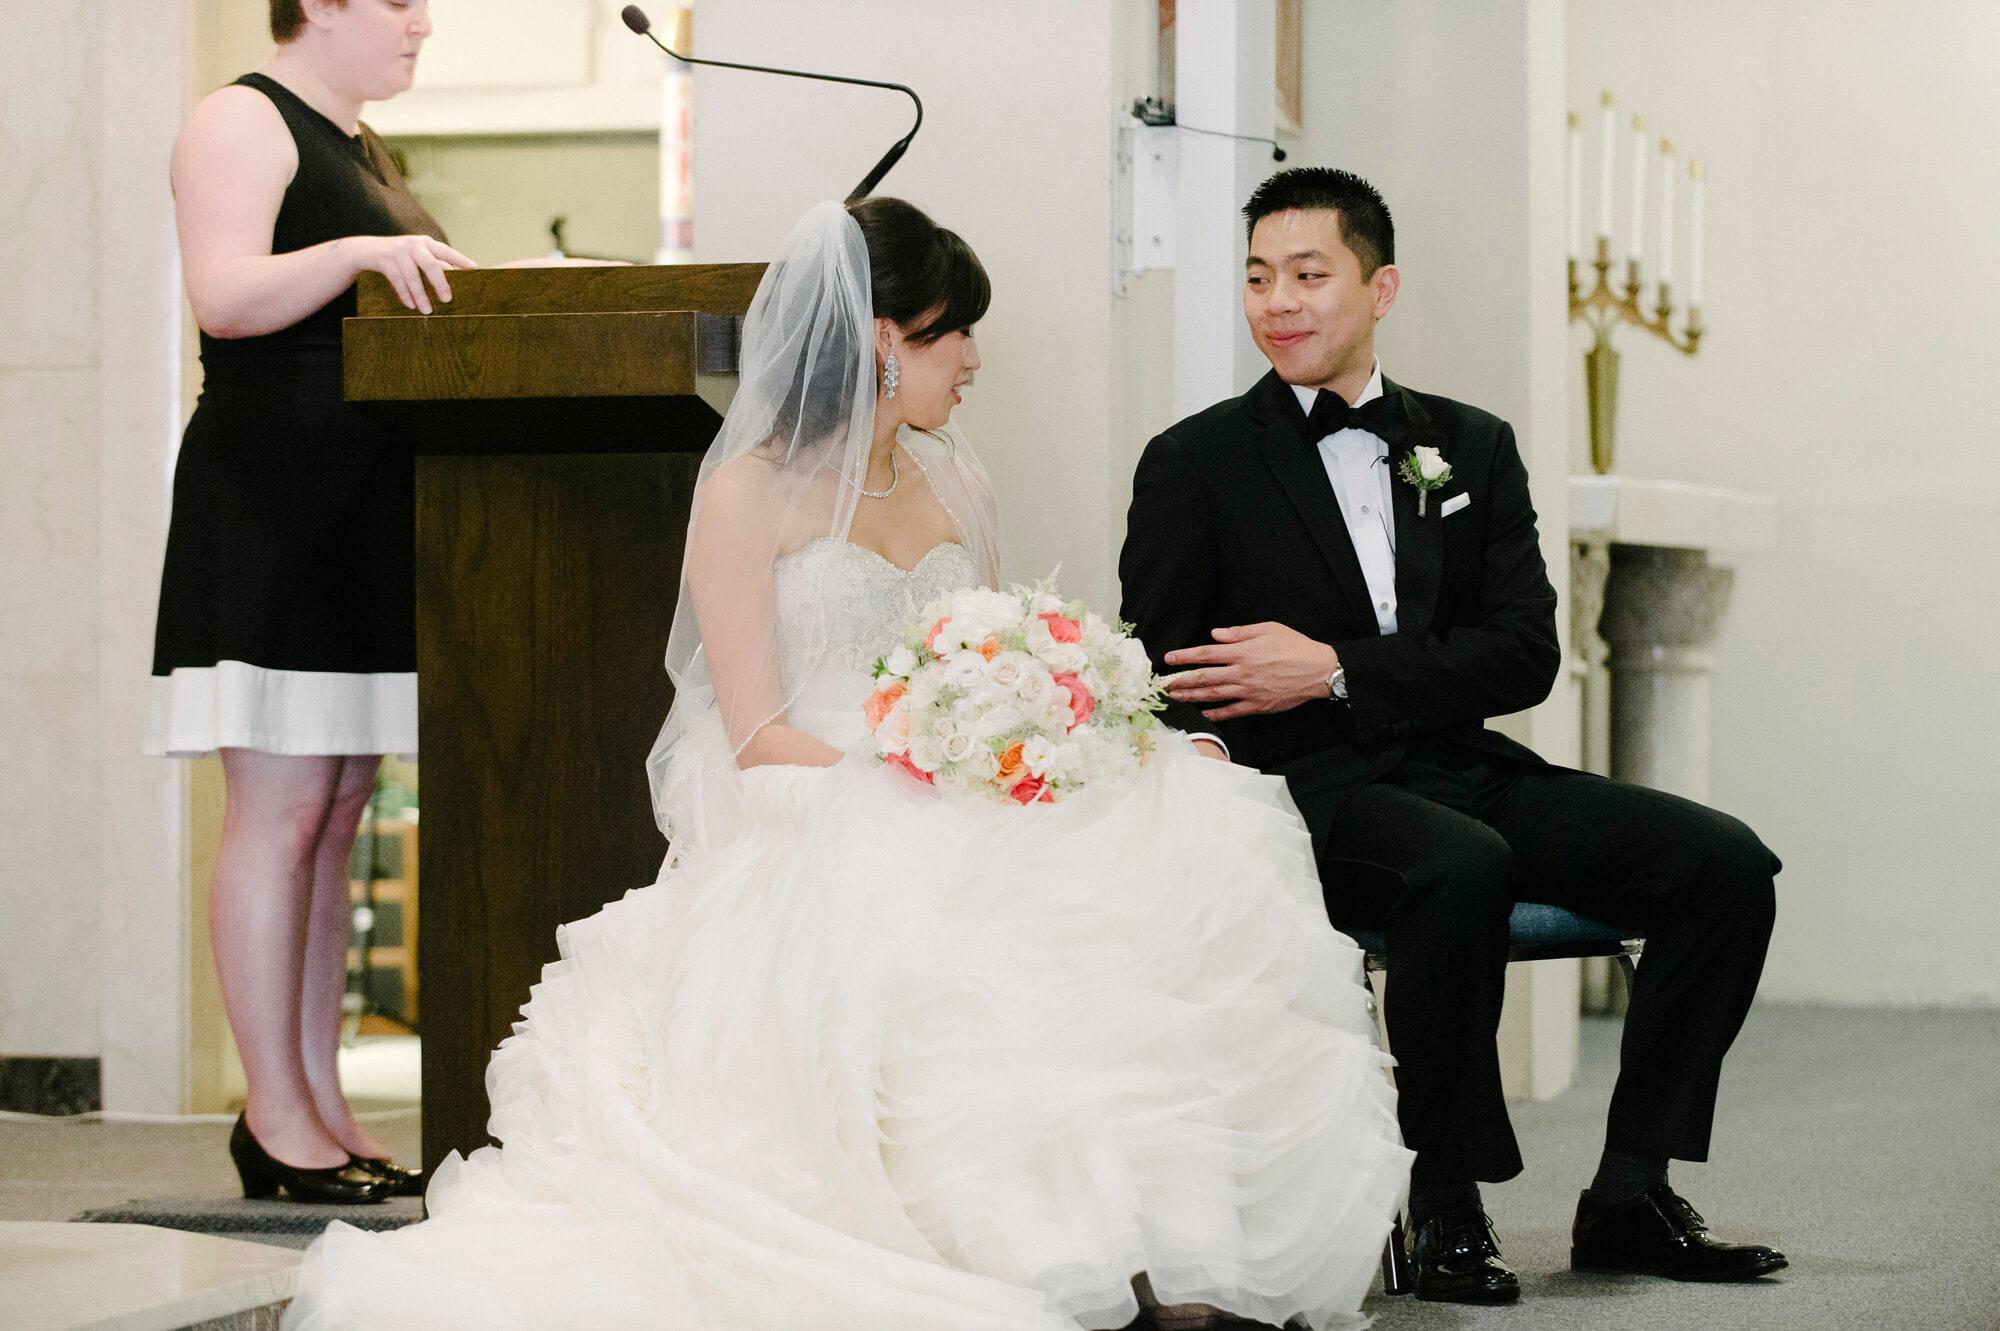 bride and groom share smile sitting during catholic wedding ceremony